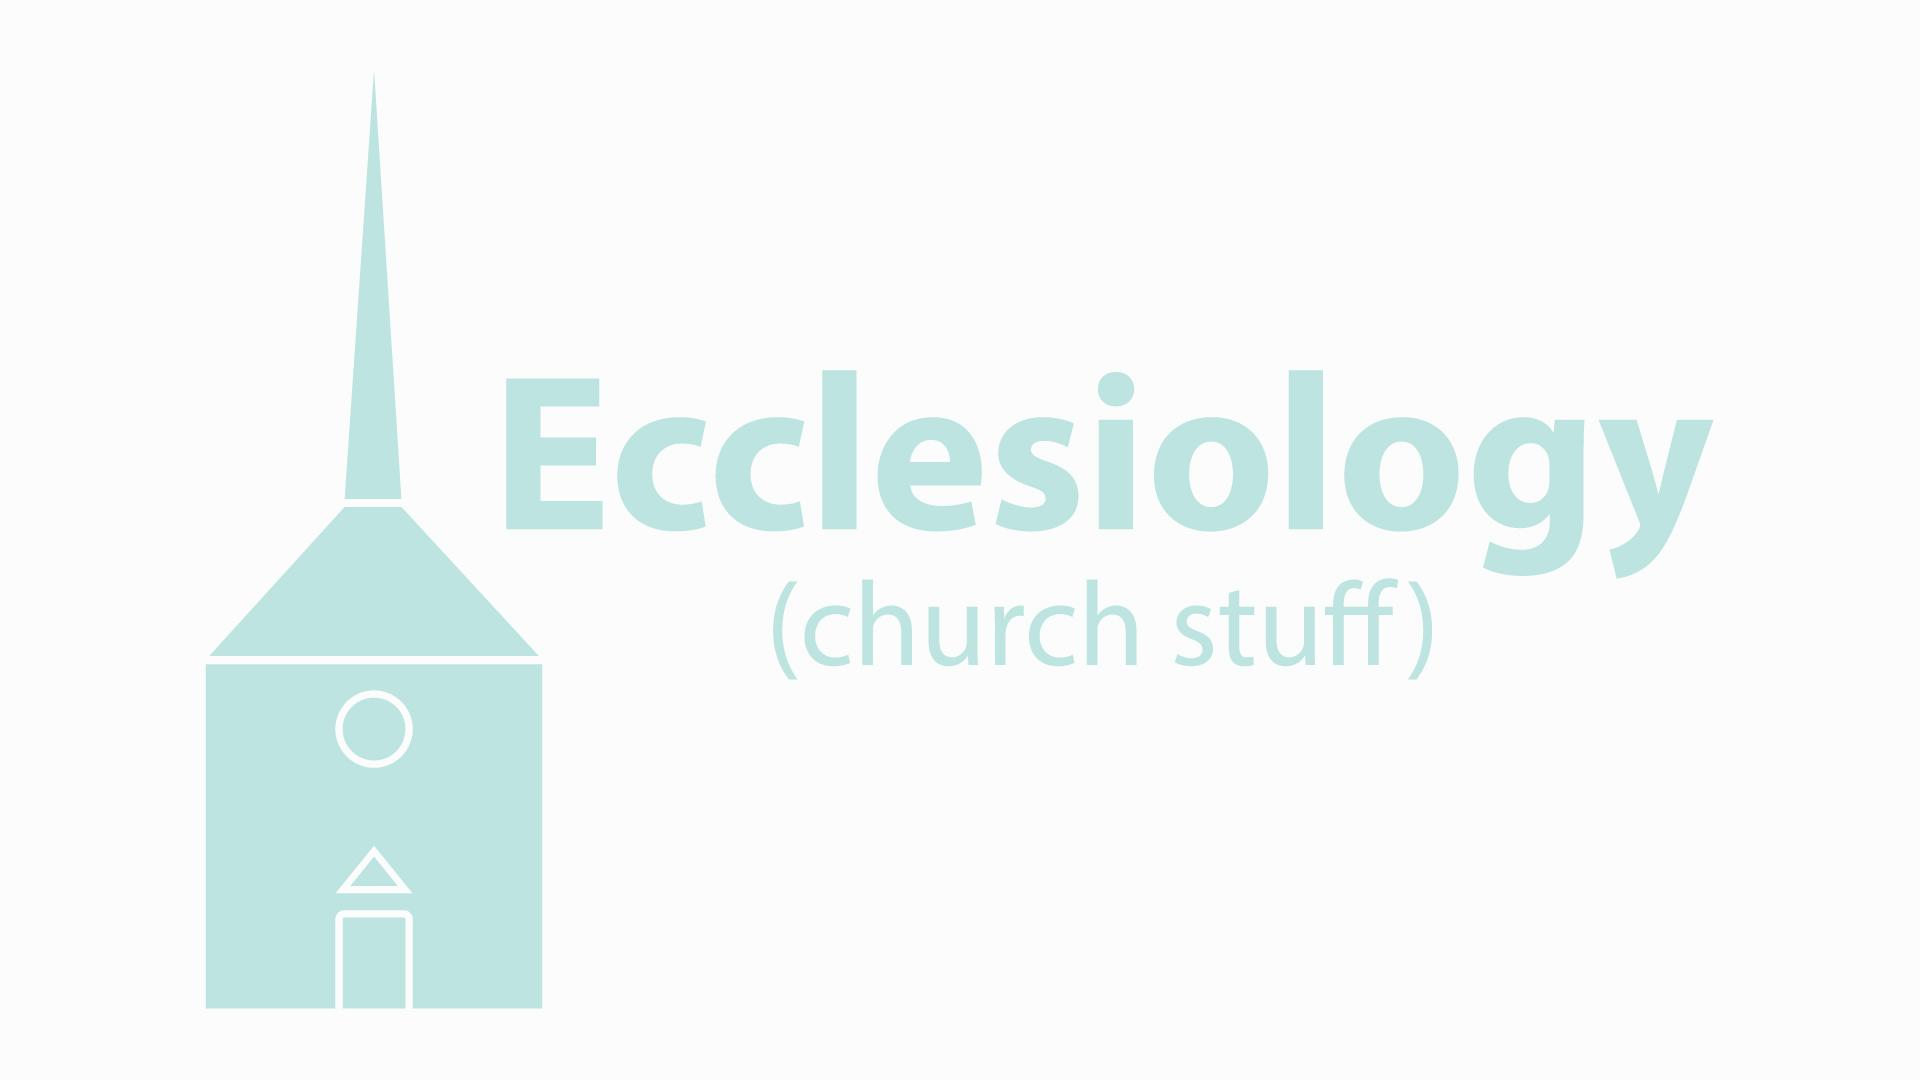 Ecclesiology.jpg